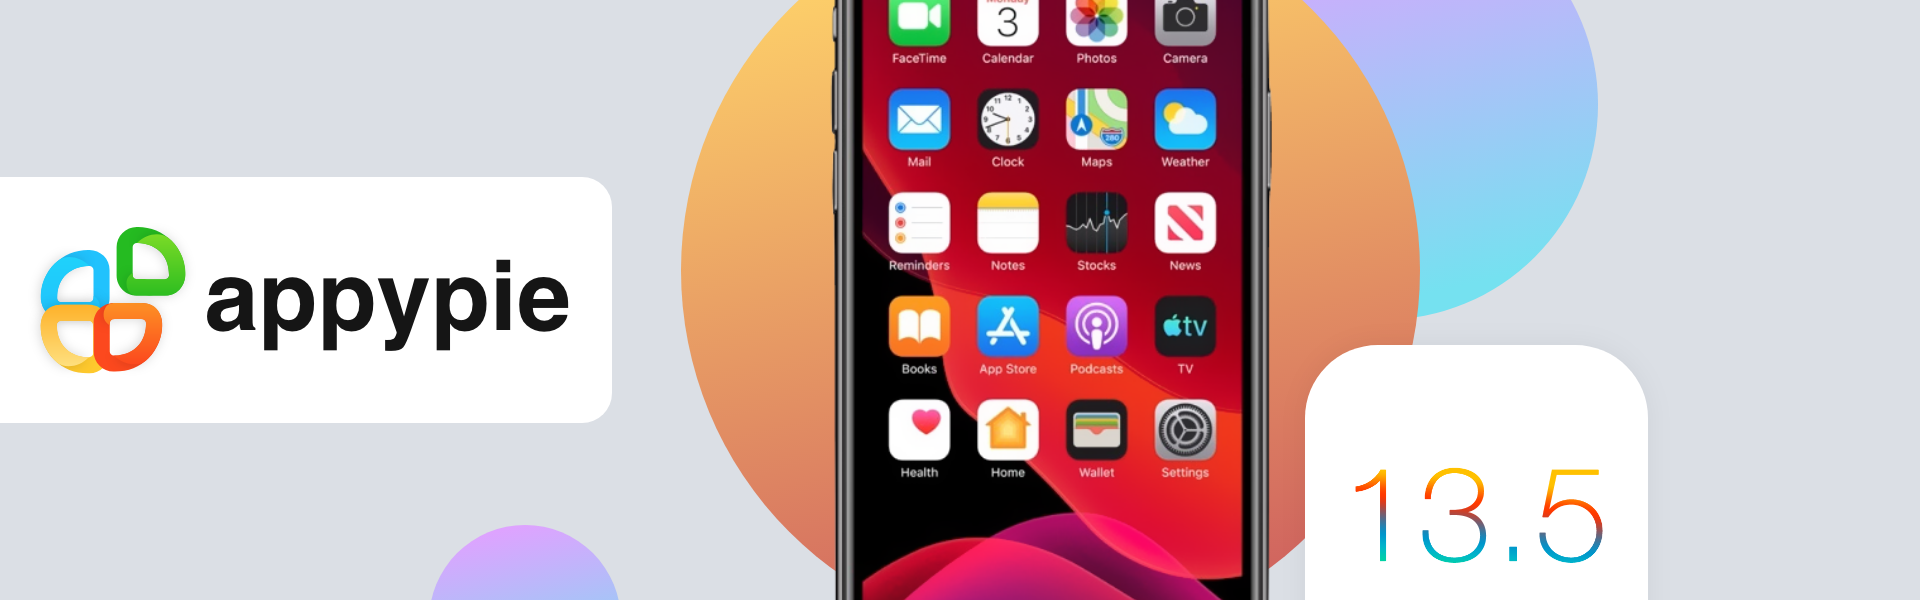 New jailbreak tool works on Apple's just-released iOS 13.5 - Appy Pie